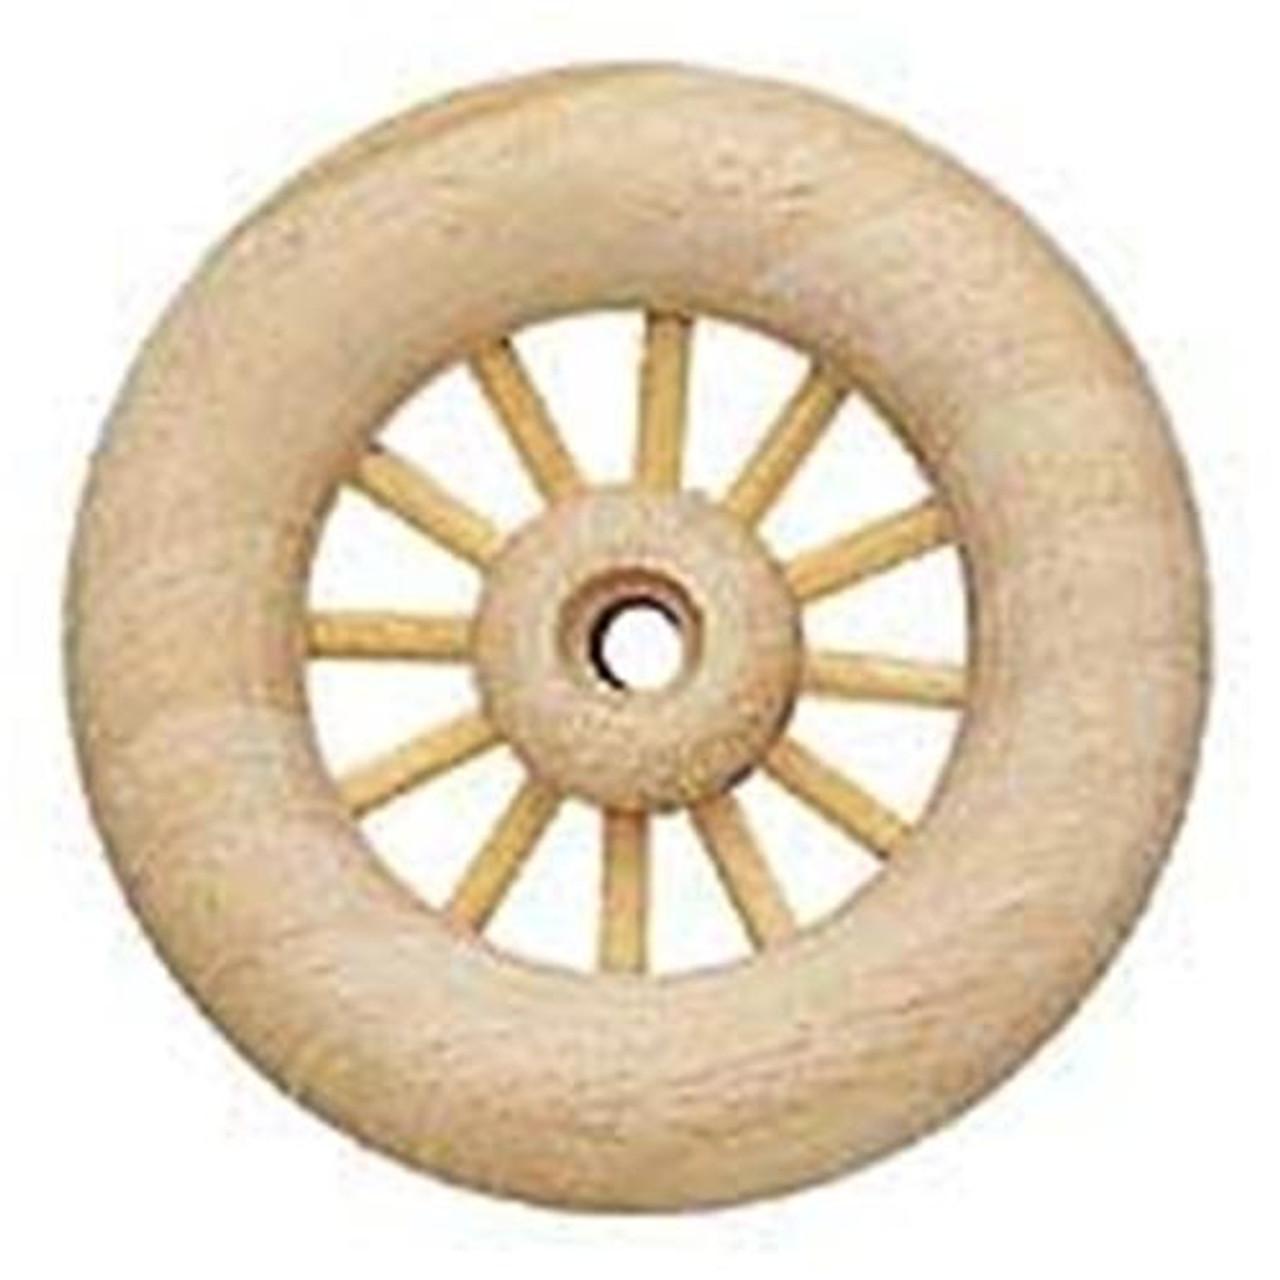 Cherry Tree Toys 4 1/4 Spoked Wood Toy Wheels